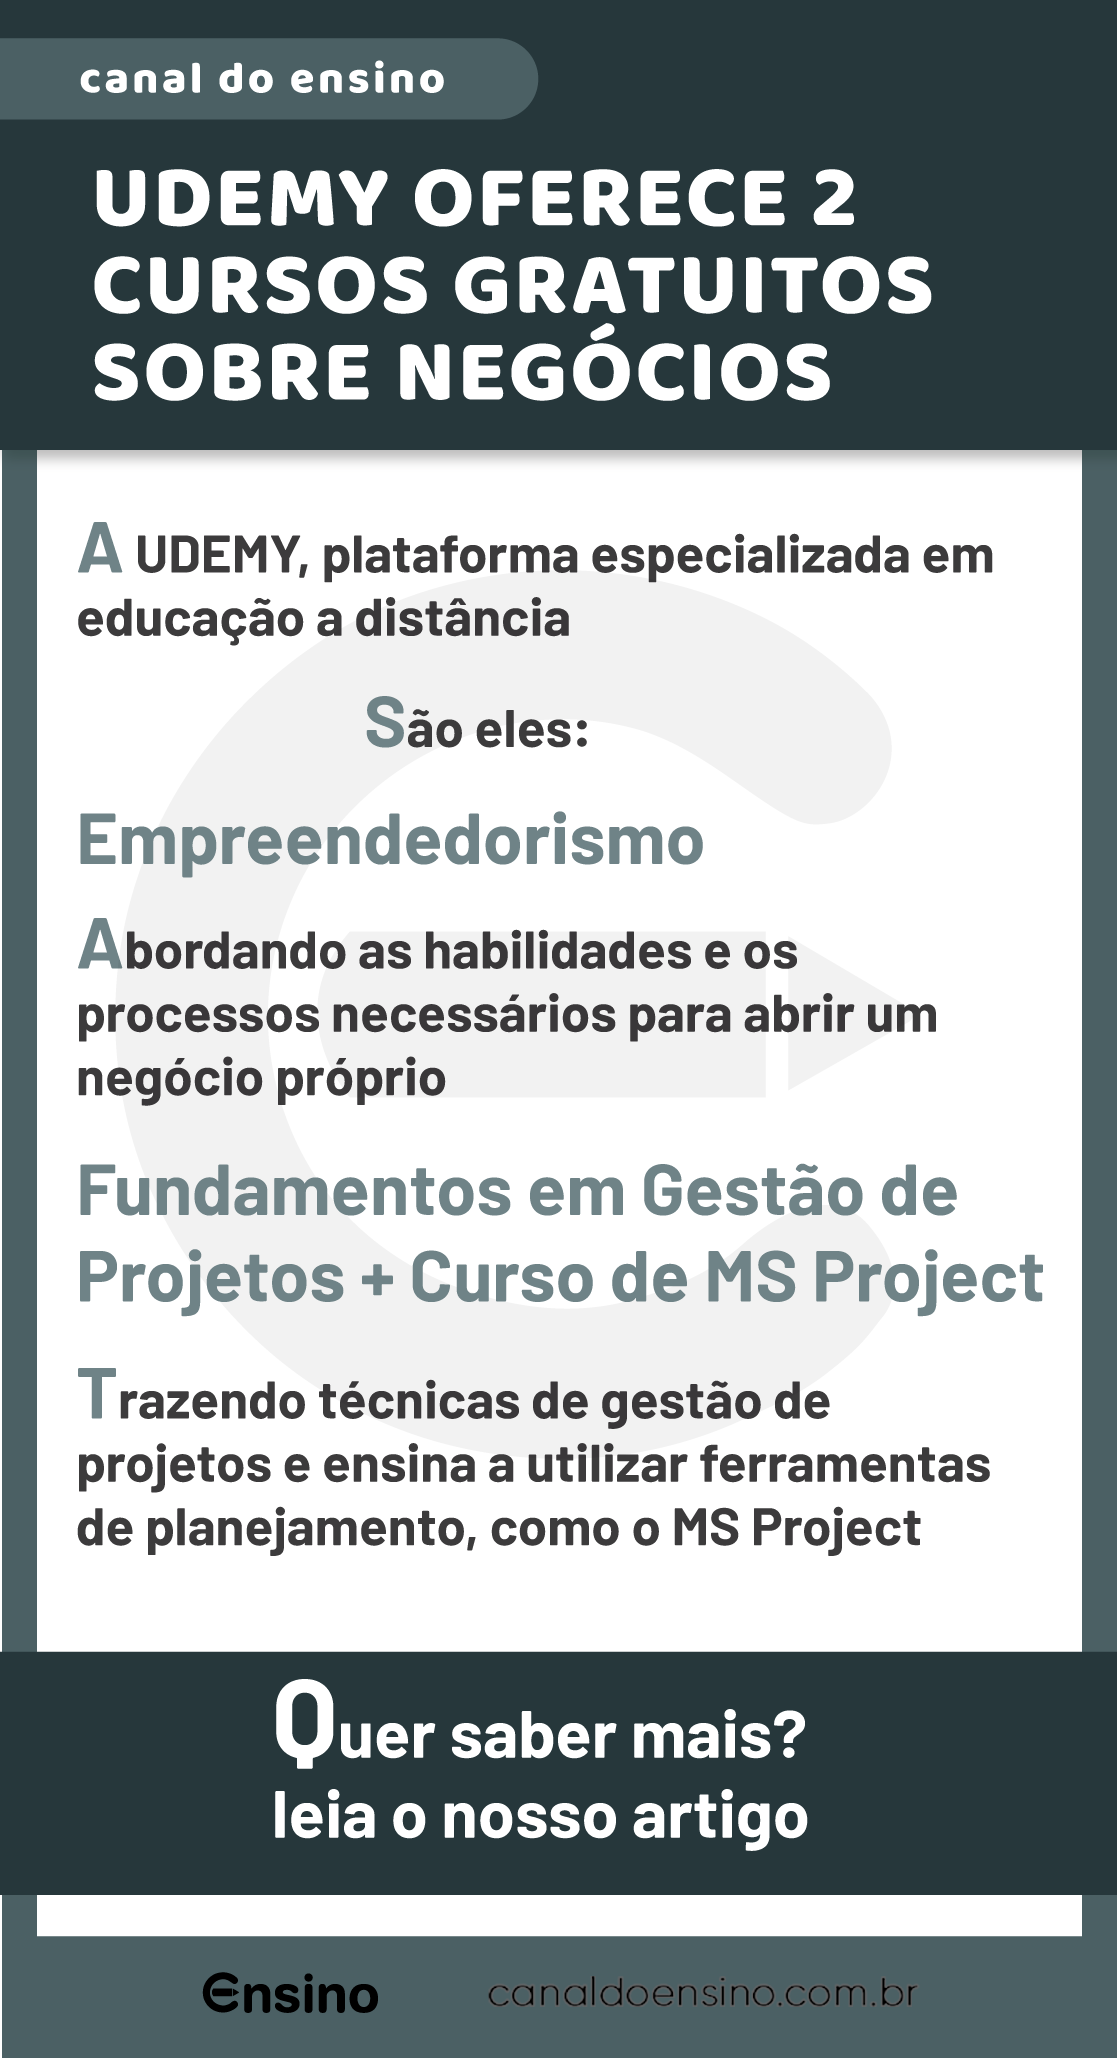 Udemy Oferece 2 Cursos Gratuitos Sobre Negocios Cursos Gratuitos Sites De Cursos Online Cursos